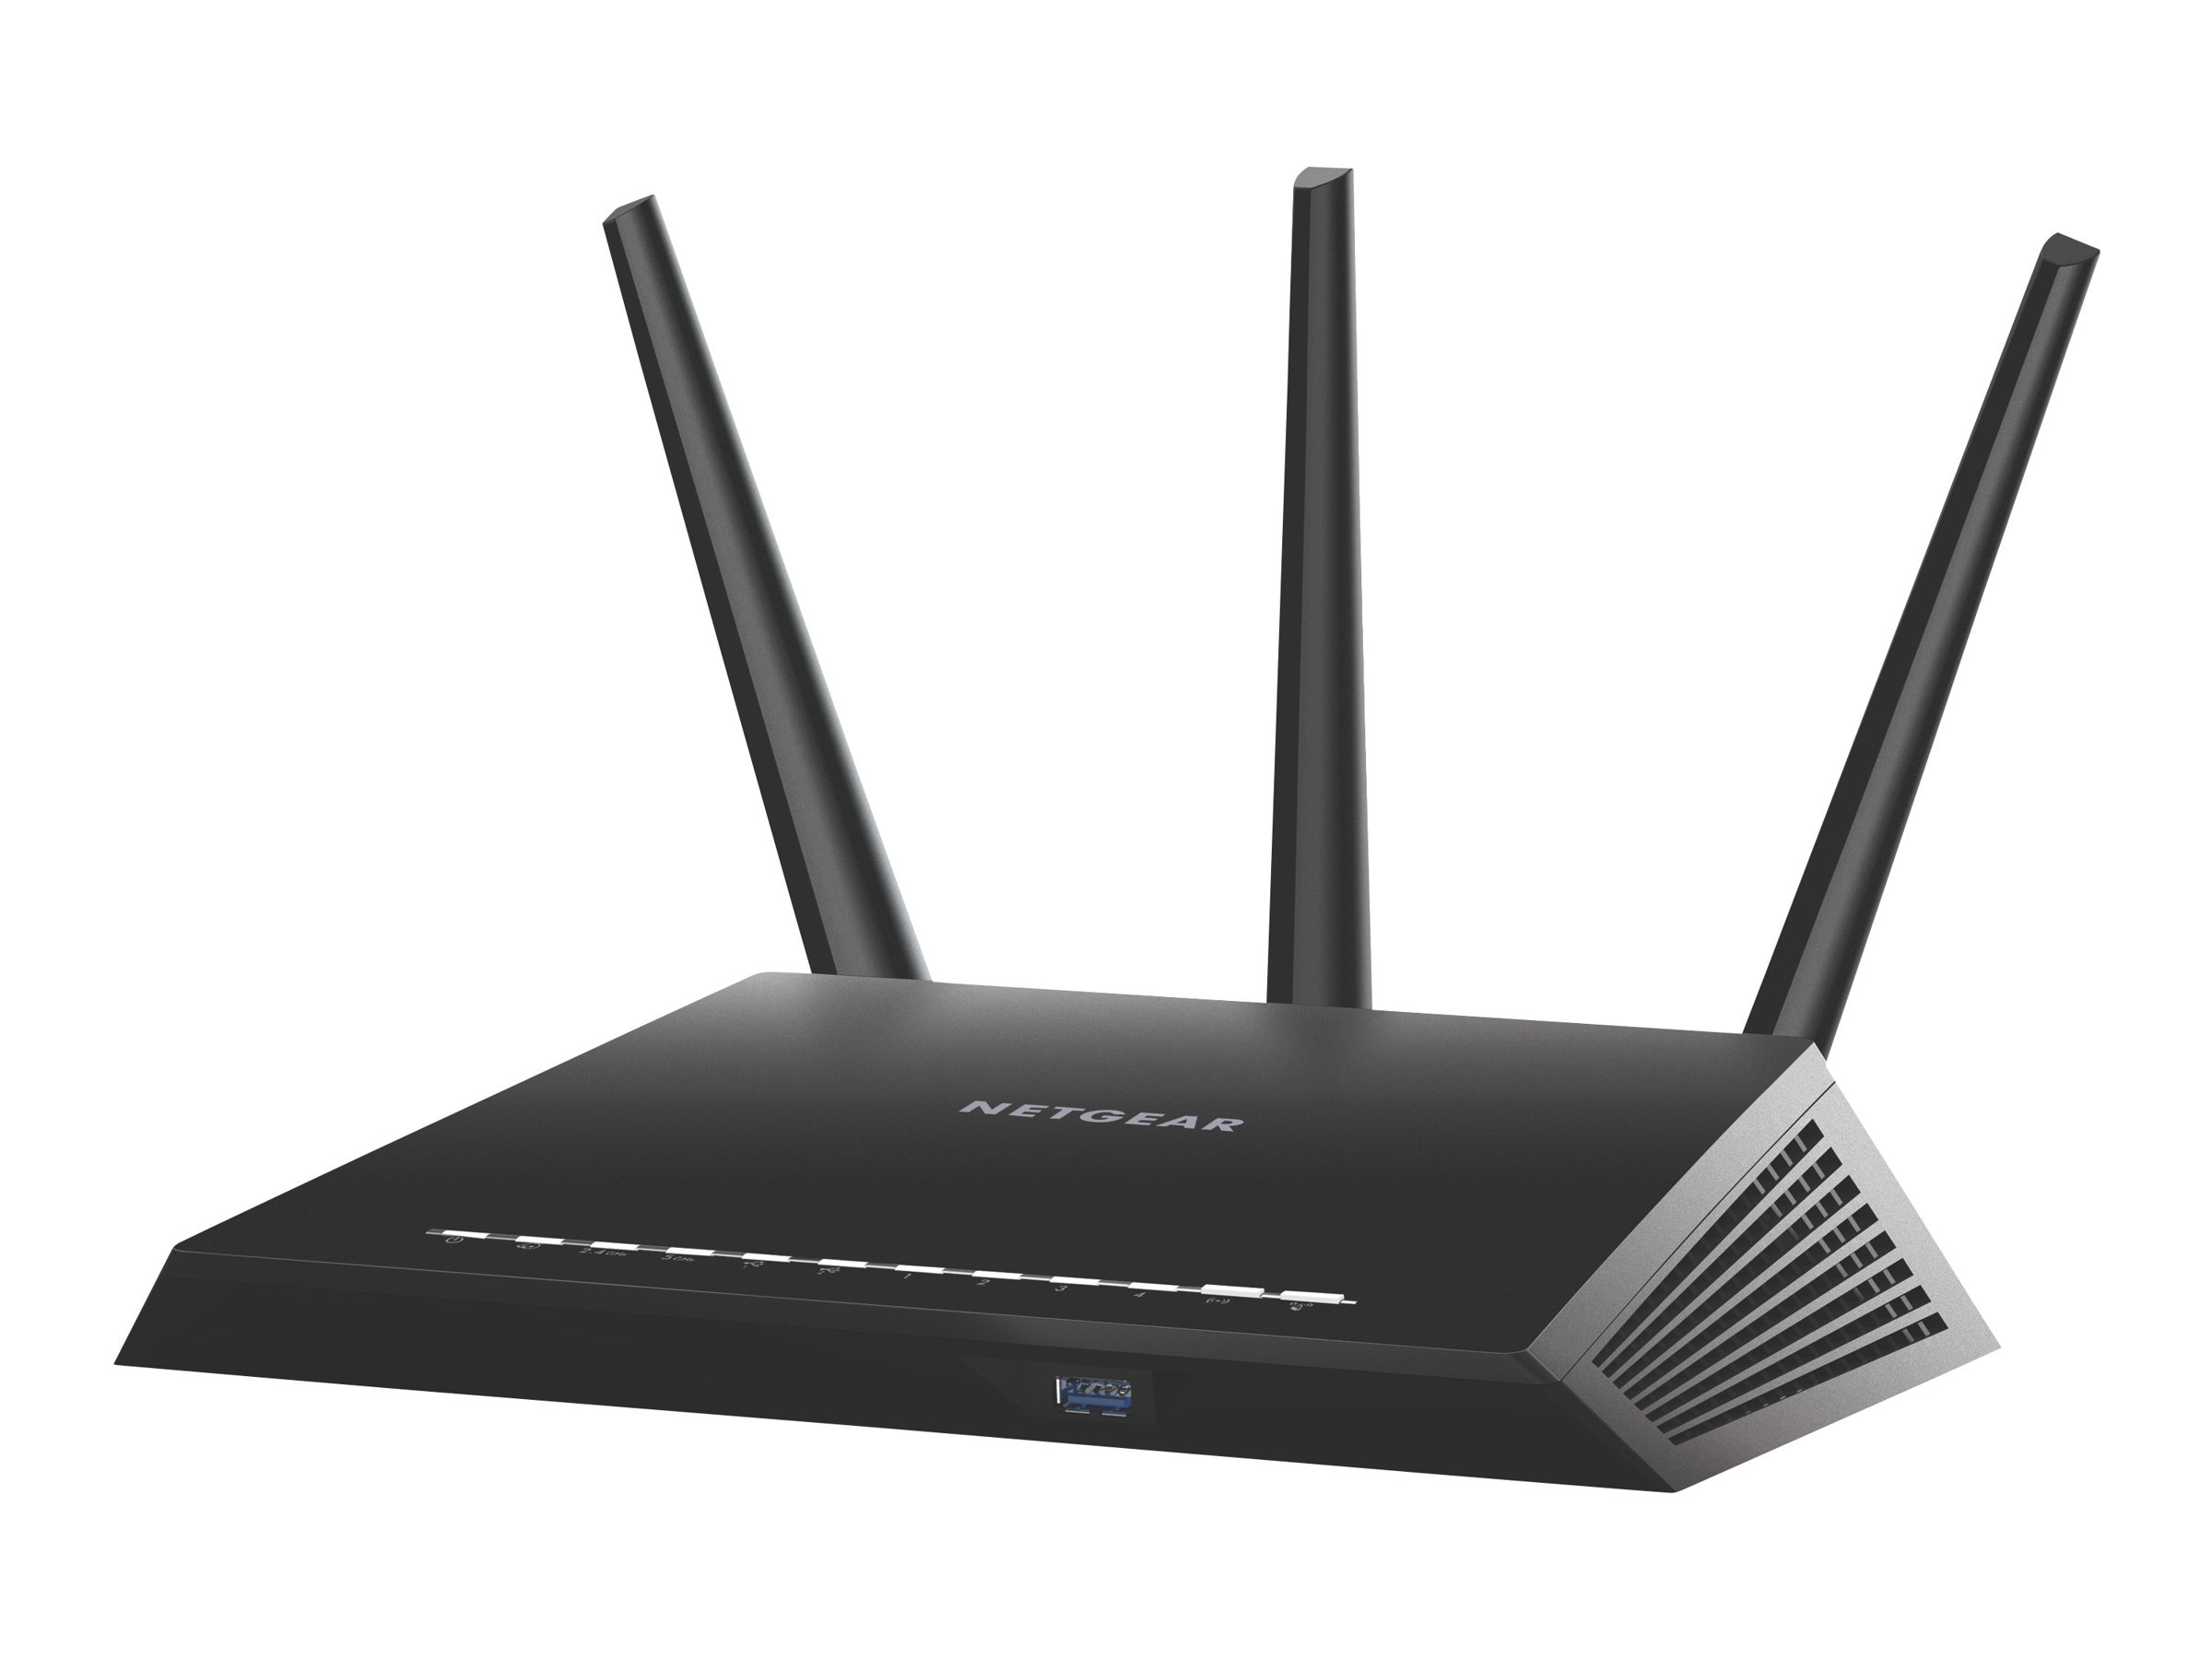 Vorschau: Netgear R7000 - Wireless Router - 4-Port-Switch